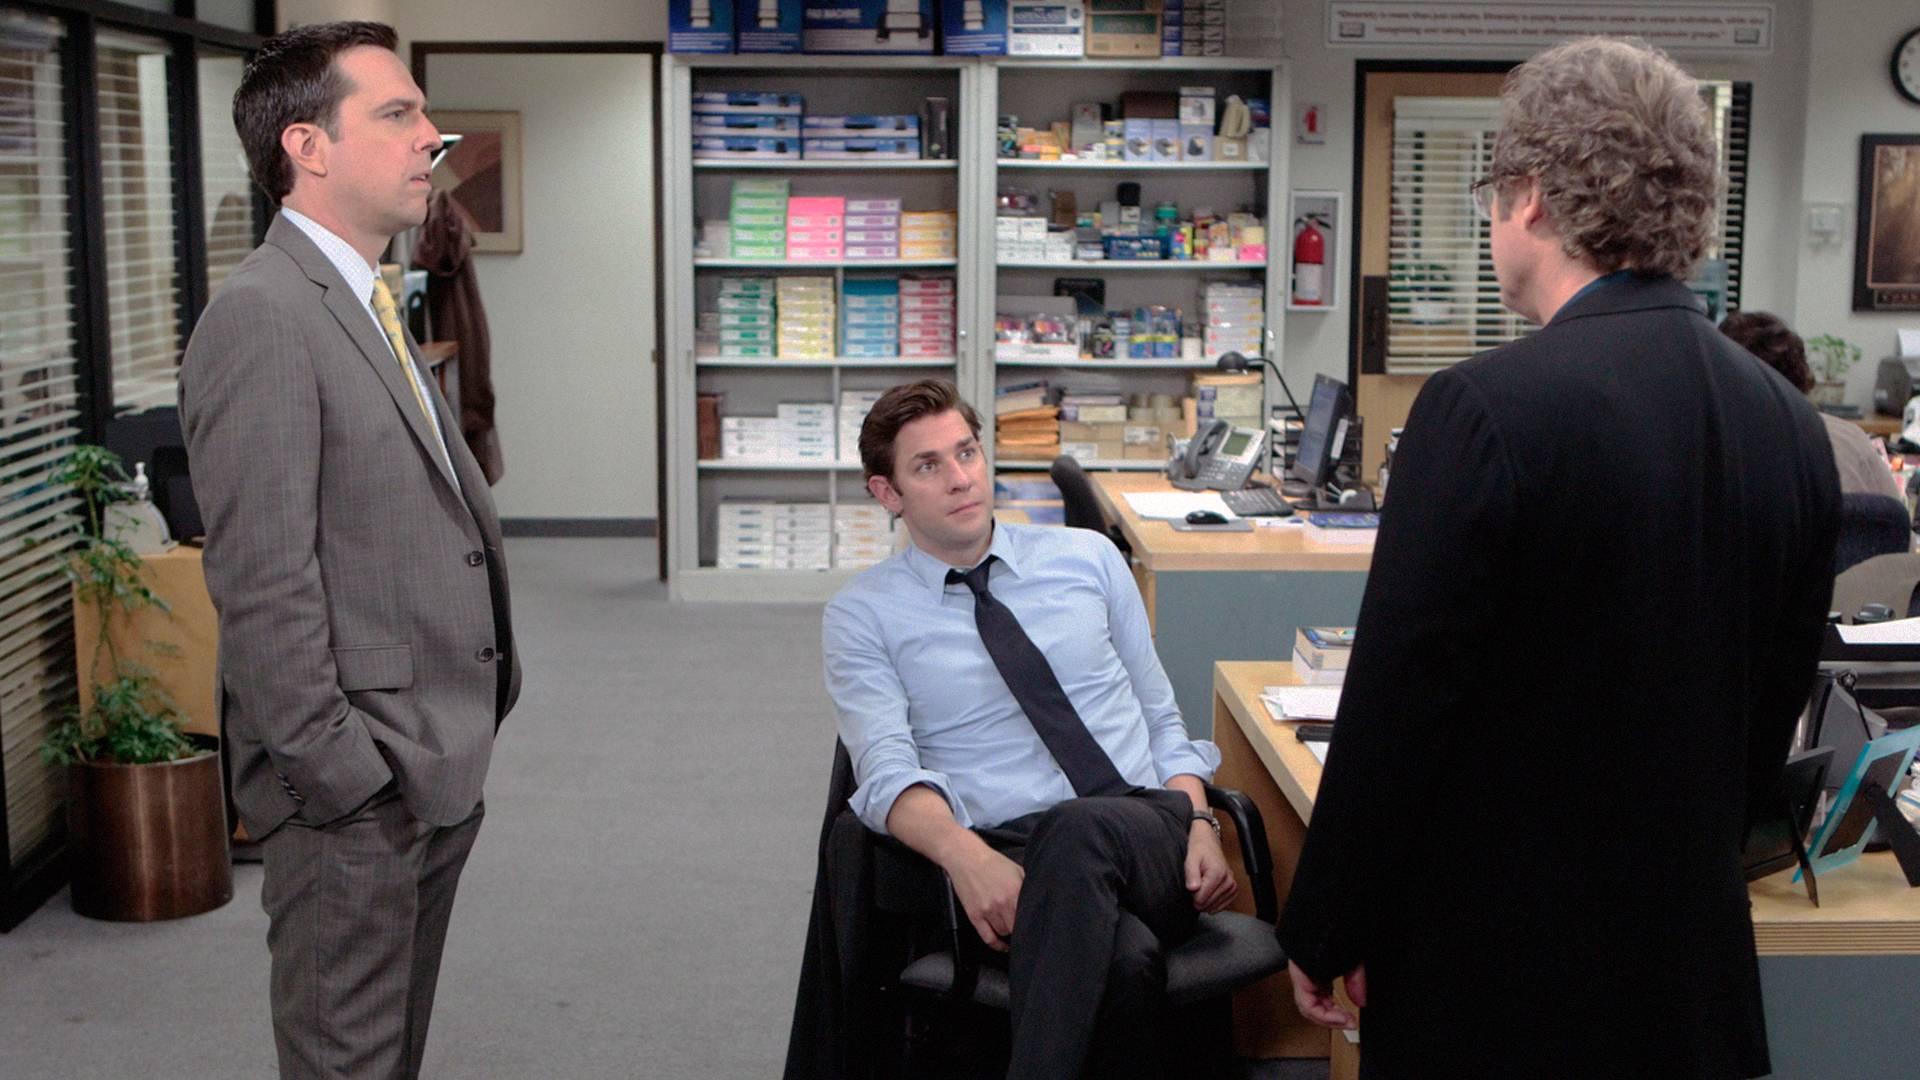 The Office Season 8 Episode 9